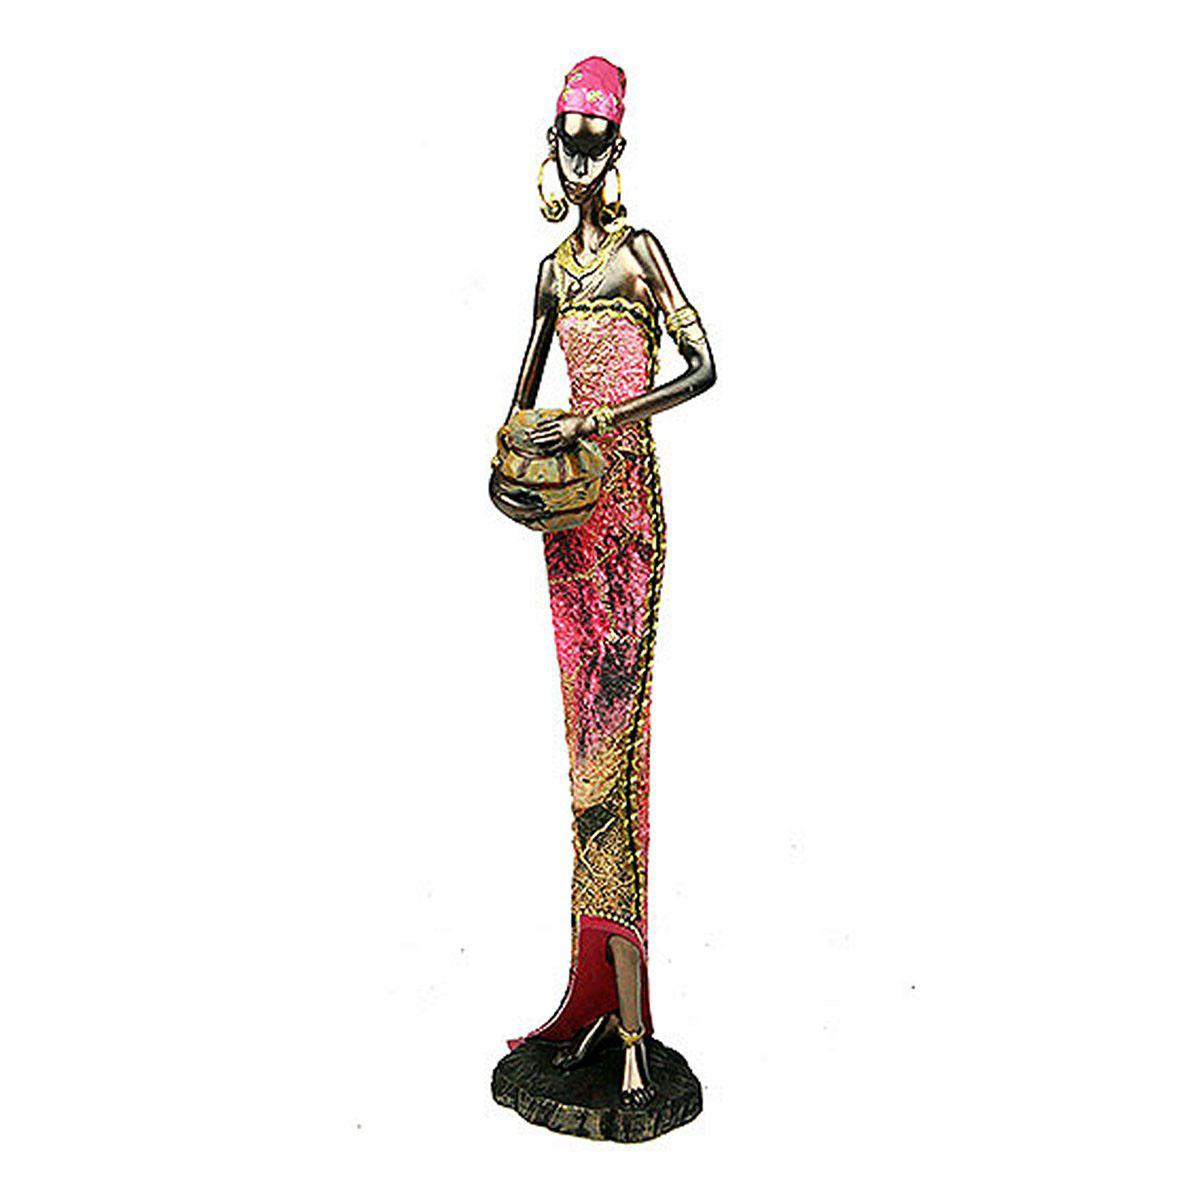 Статуэтка Русские Подарки Африканка, 6 х 8 х 31 см статуэтка lefard африканка 174 311